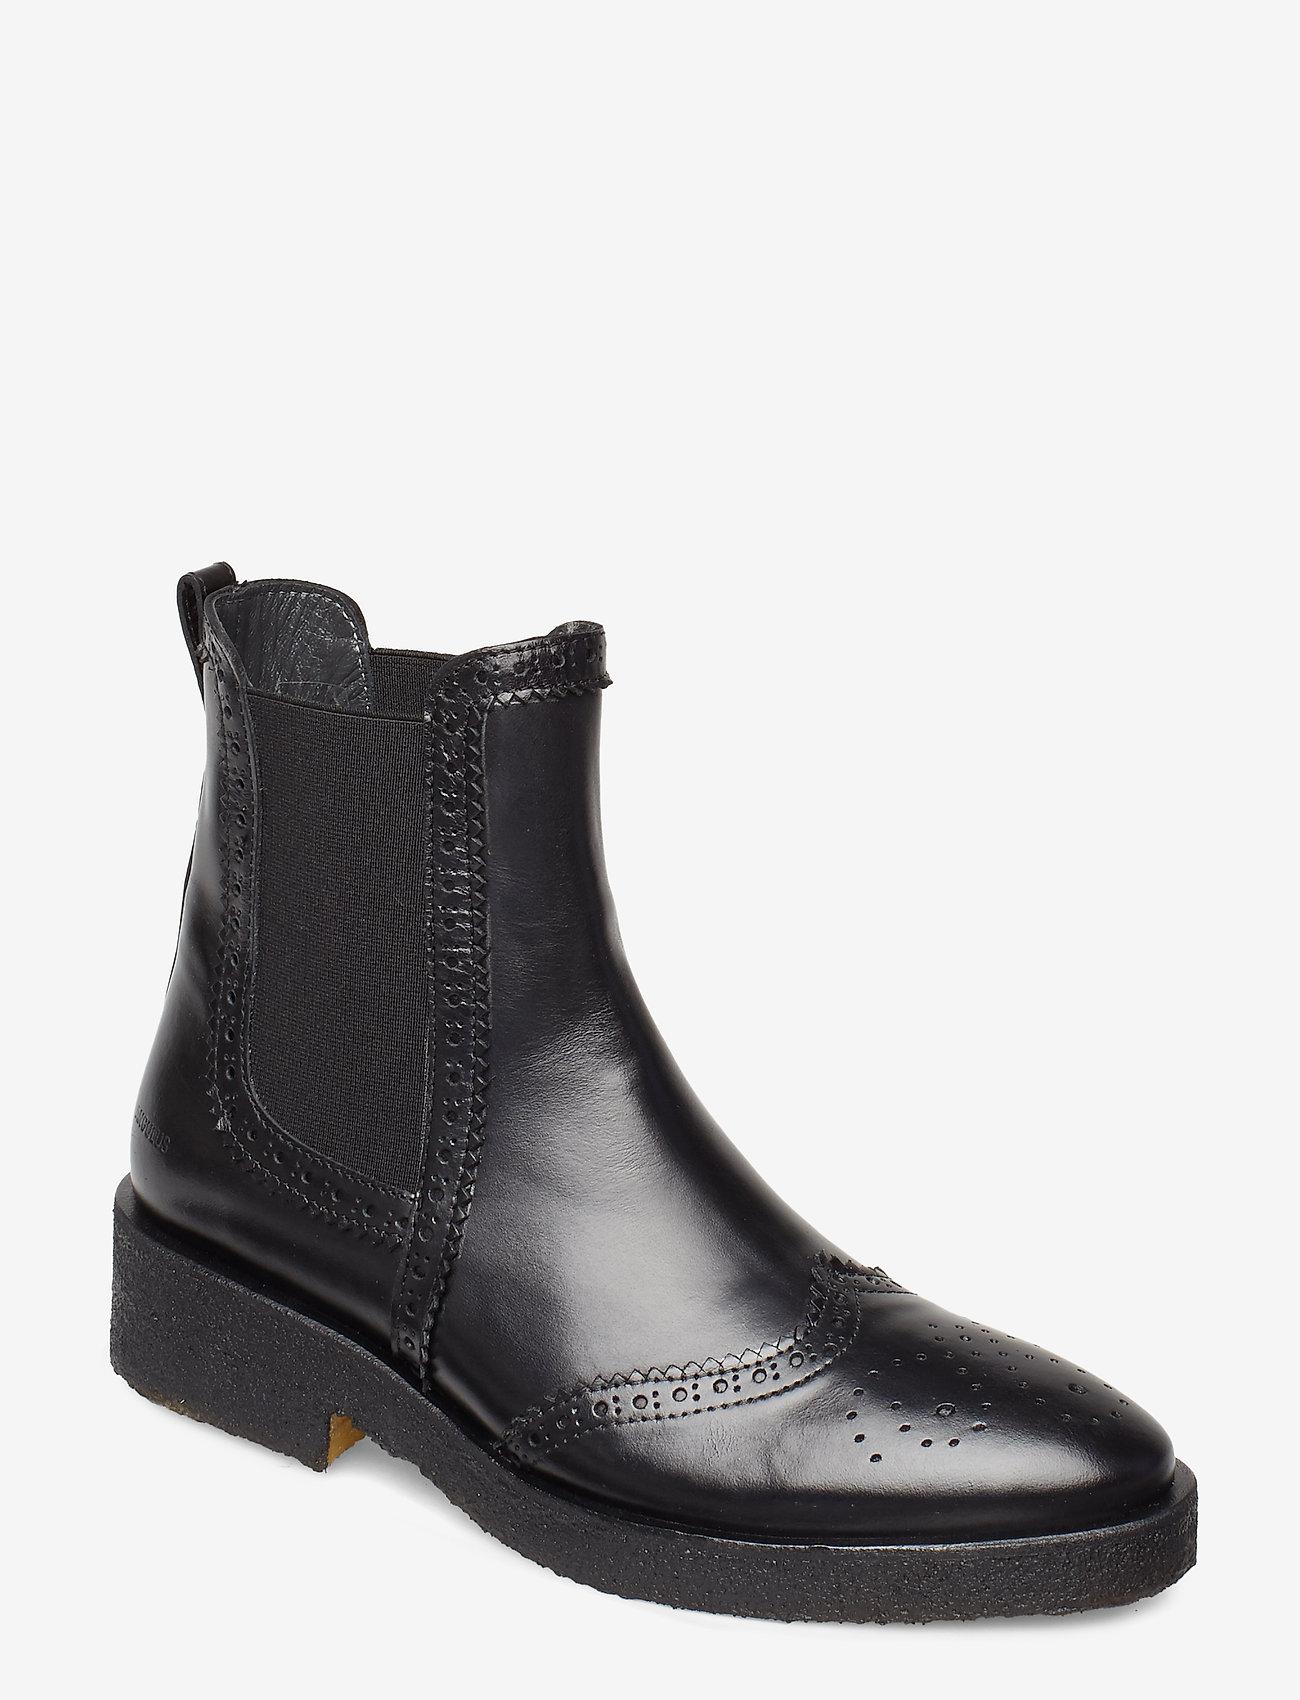 ANGULUS - Booties - flat - with elastic - chelsea støvler - 1835/001 black/black - 0